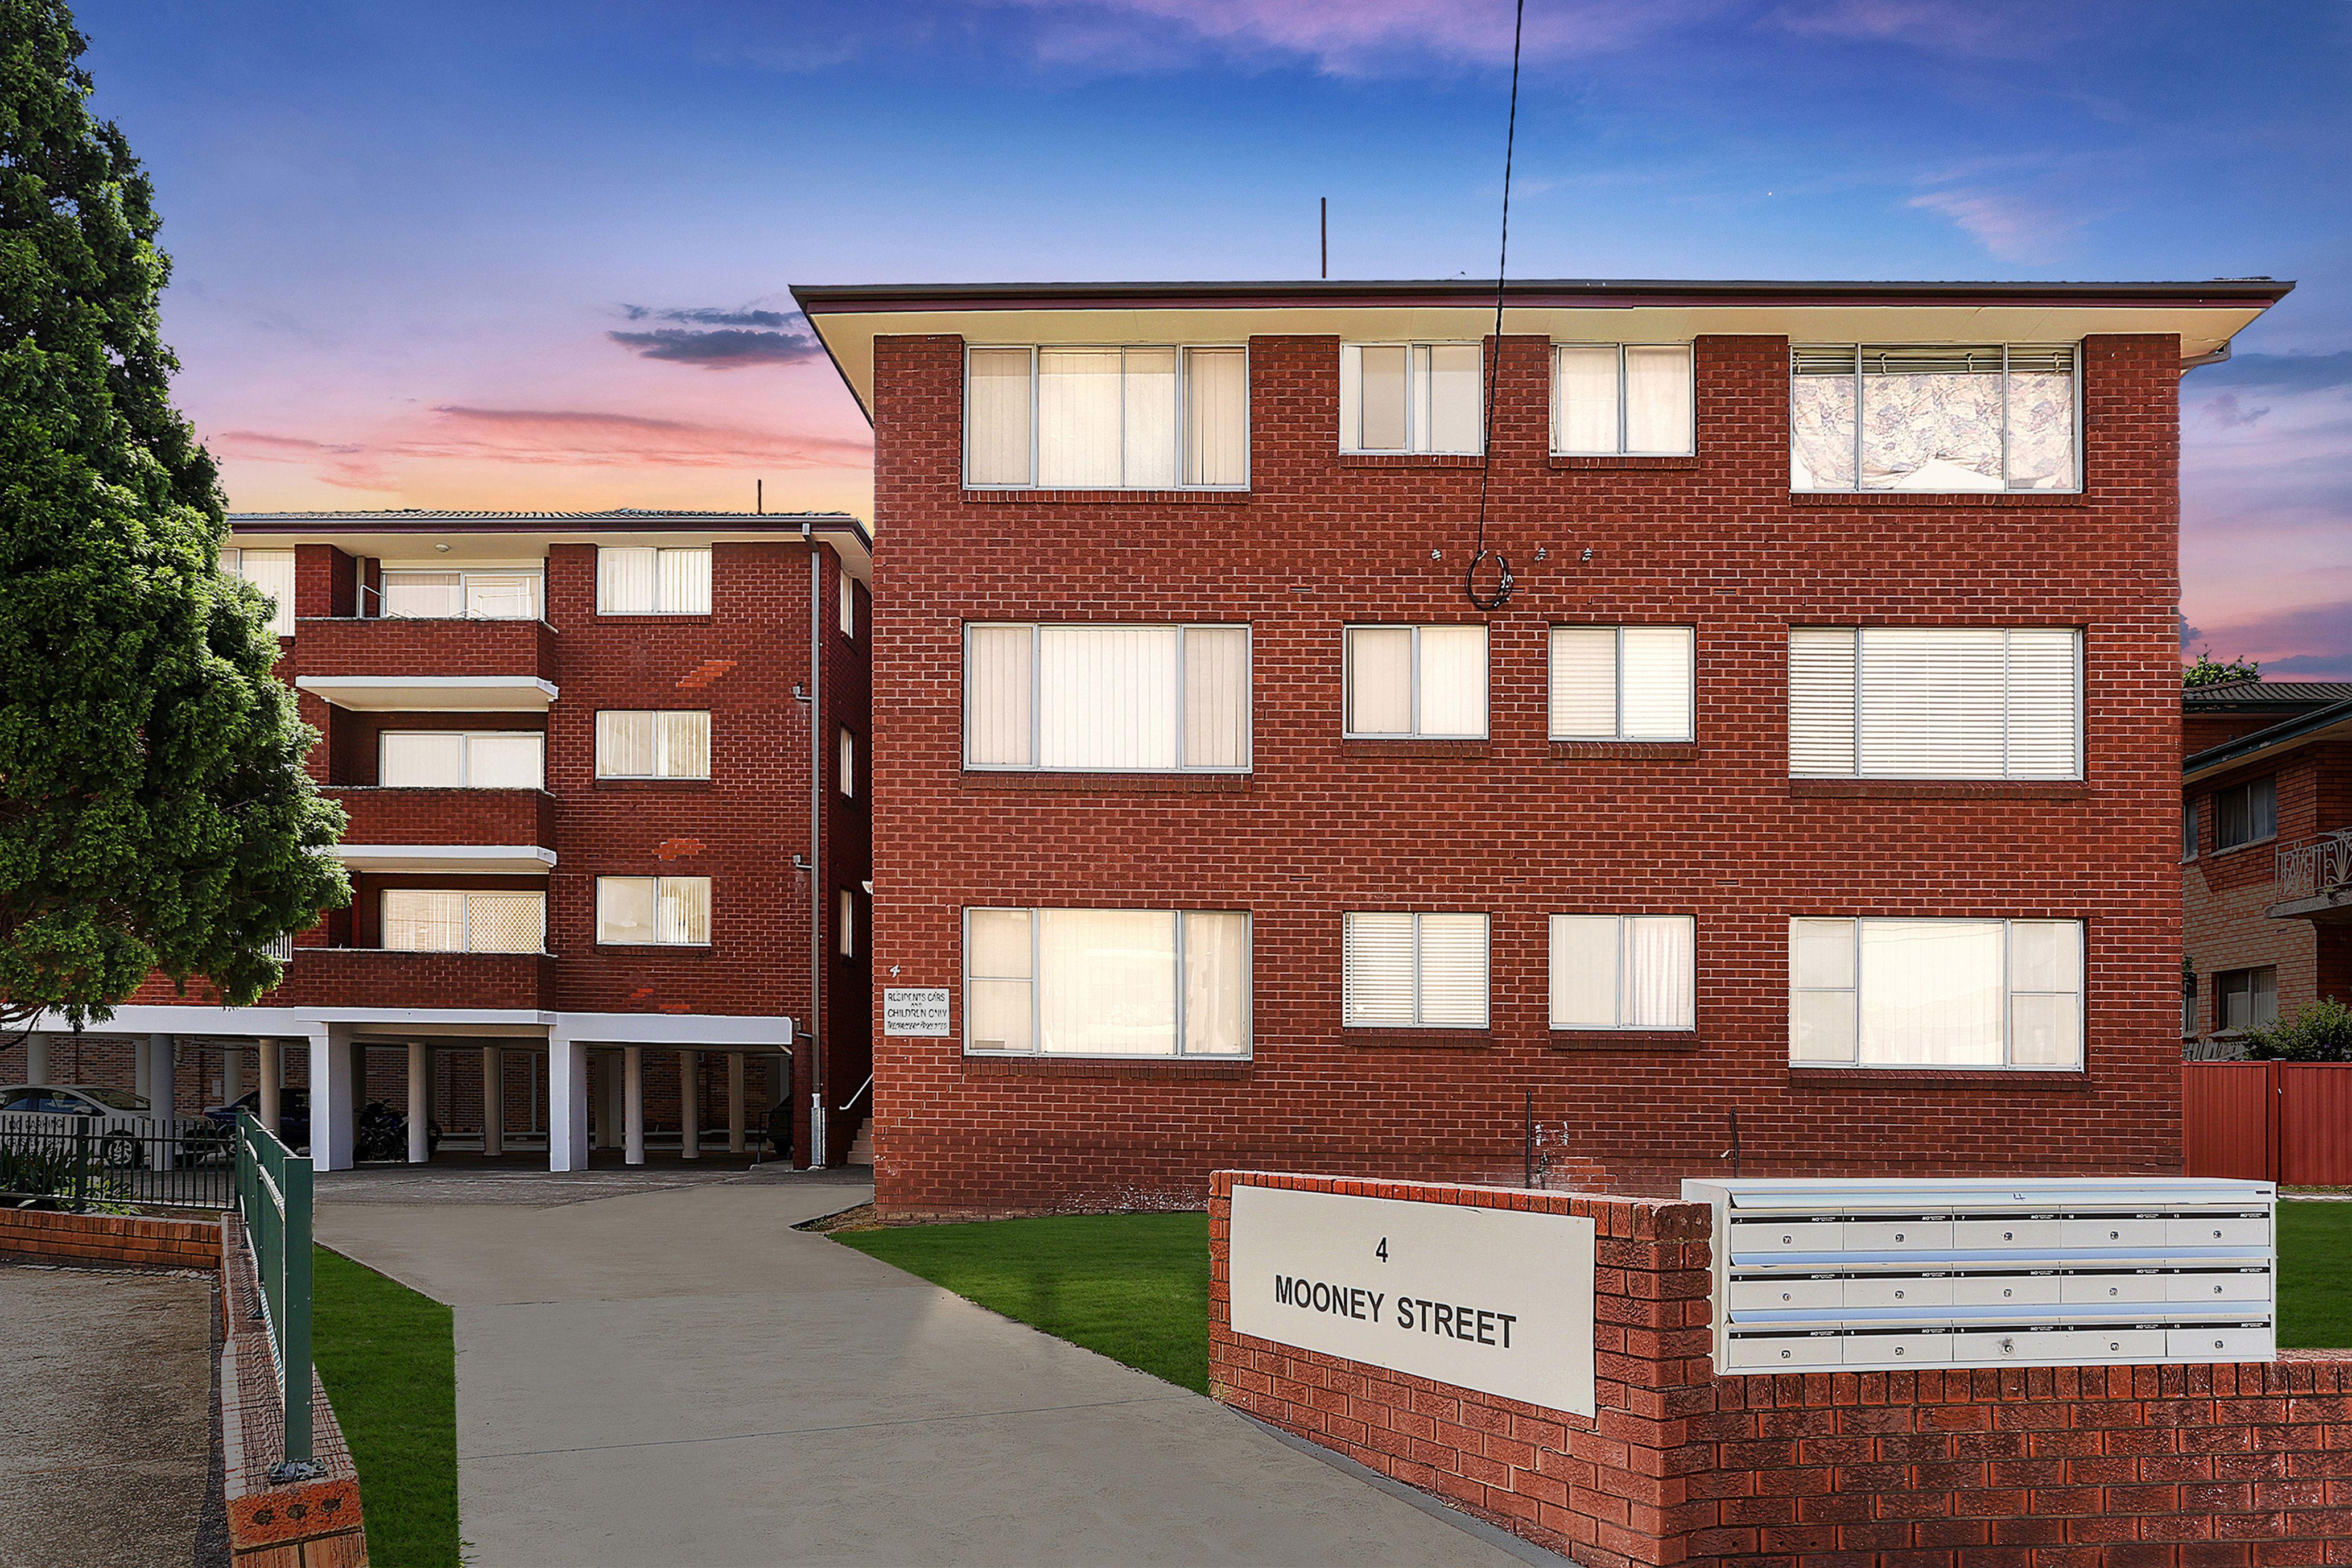 7/4 Mooney Street, Strathfield South NSW 2136